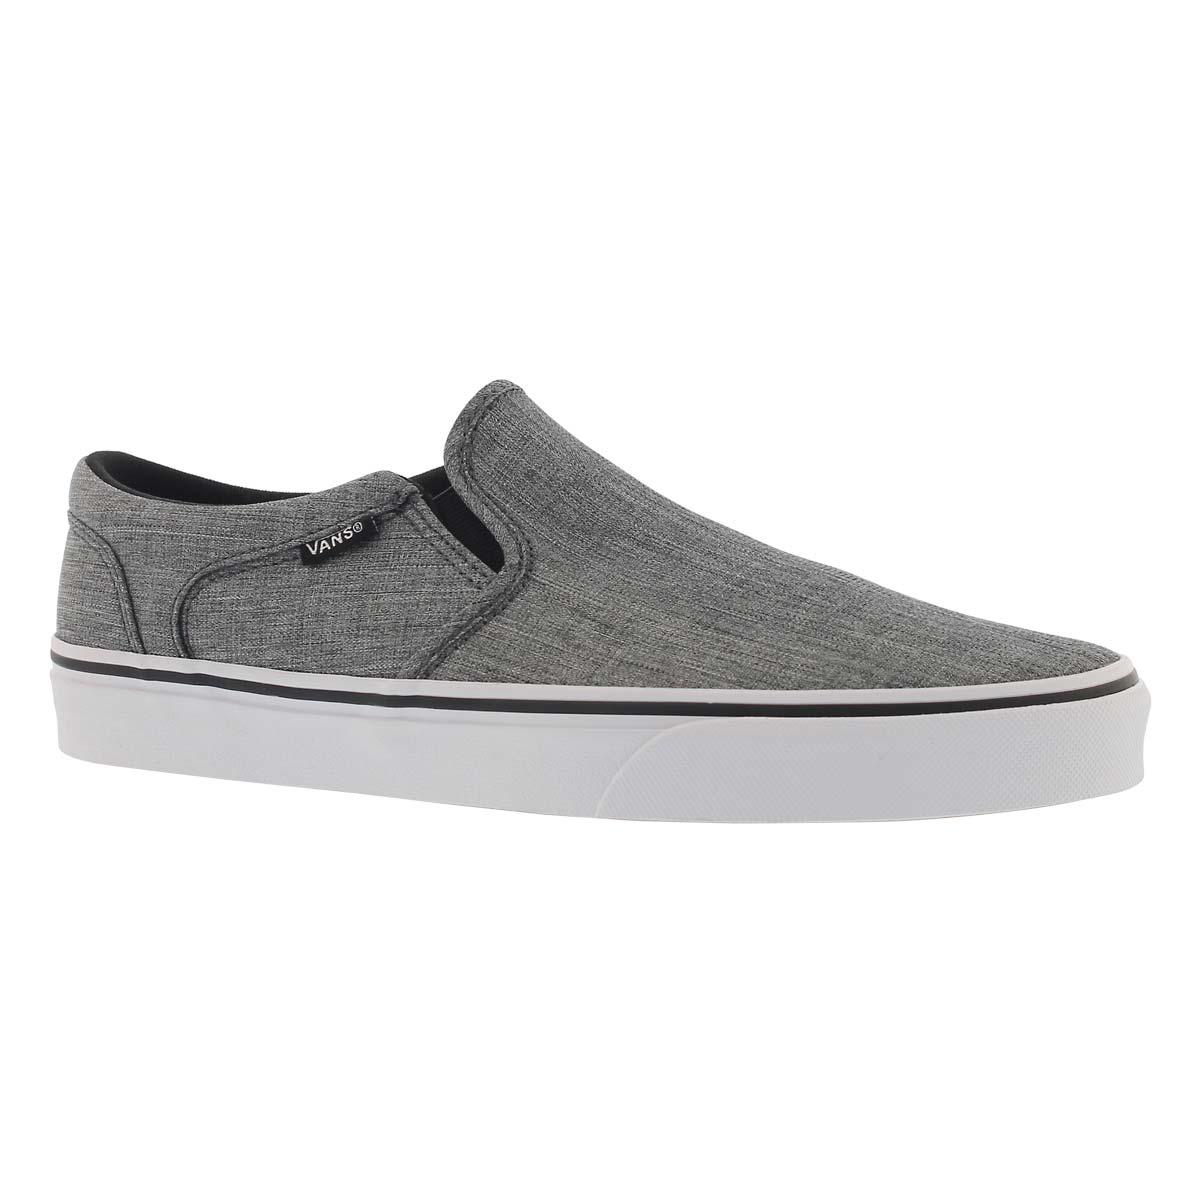 Men's ASHER grey slip on sneakers